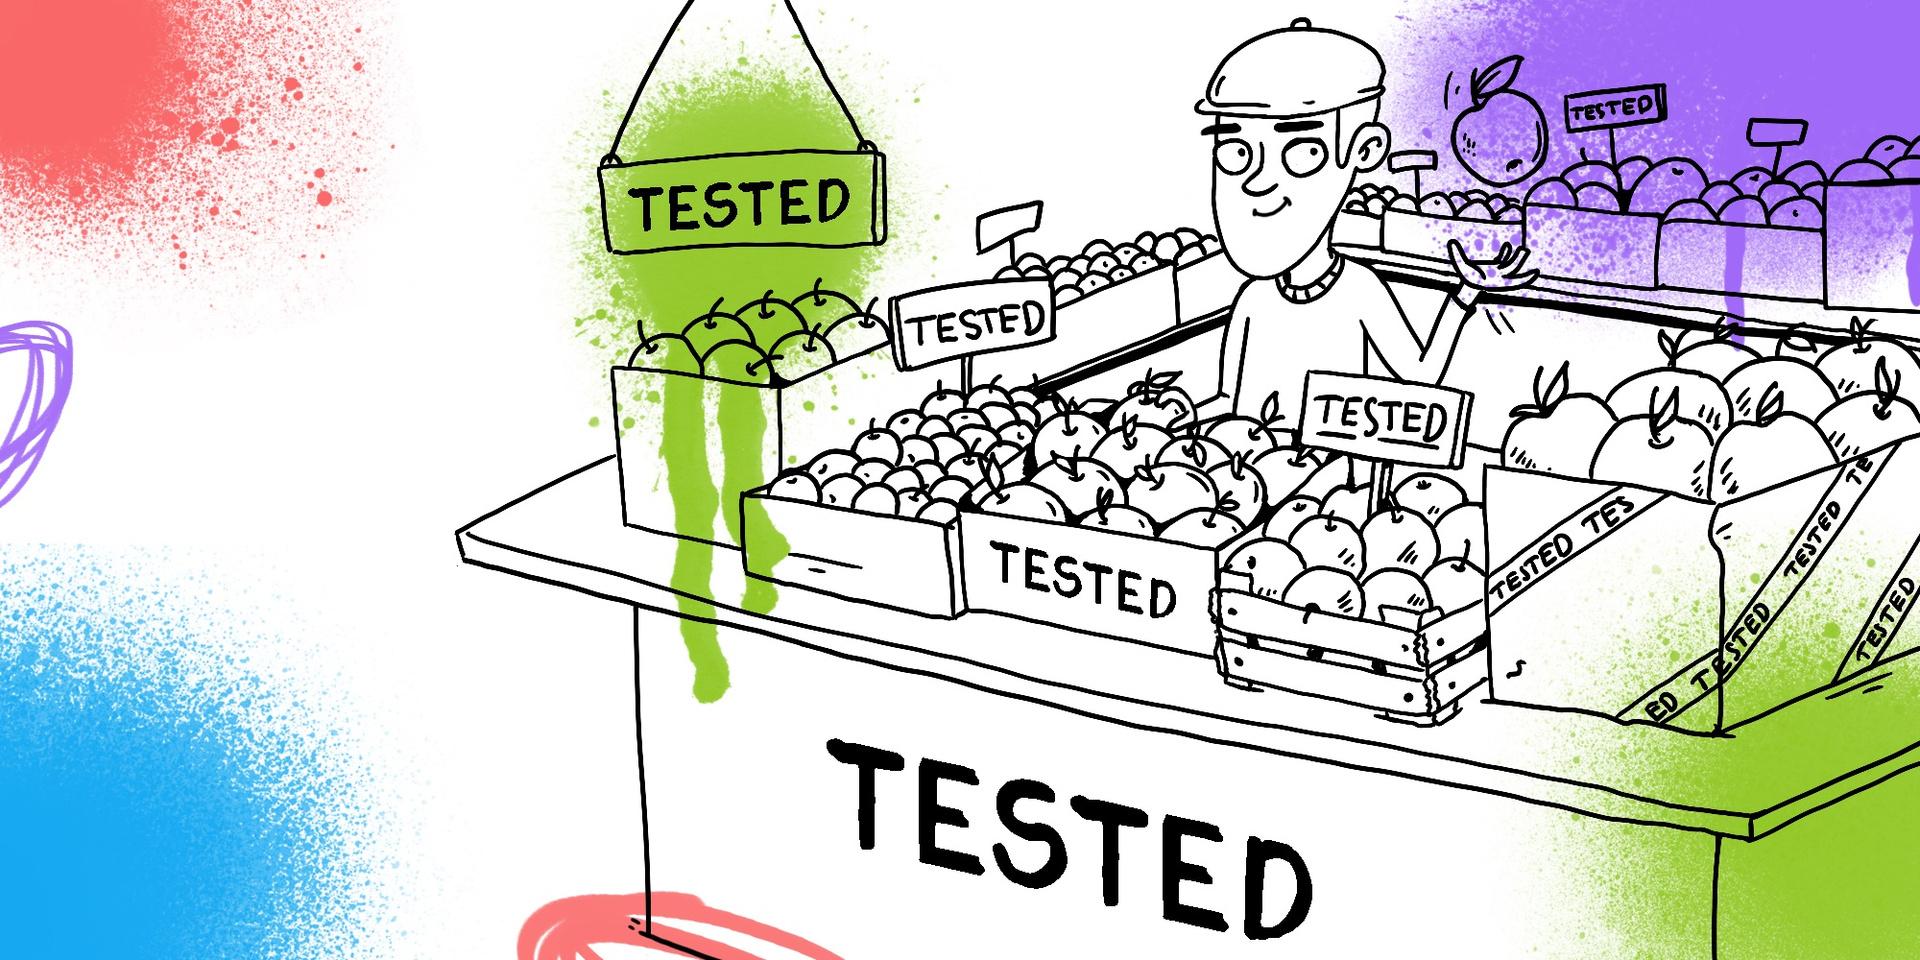 Ядро автоматизации тестирования в микросервисной архитектуре